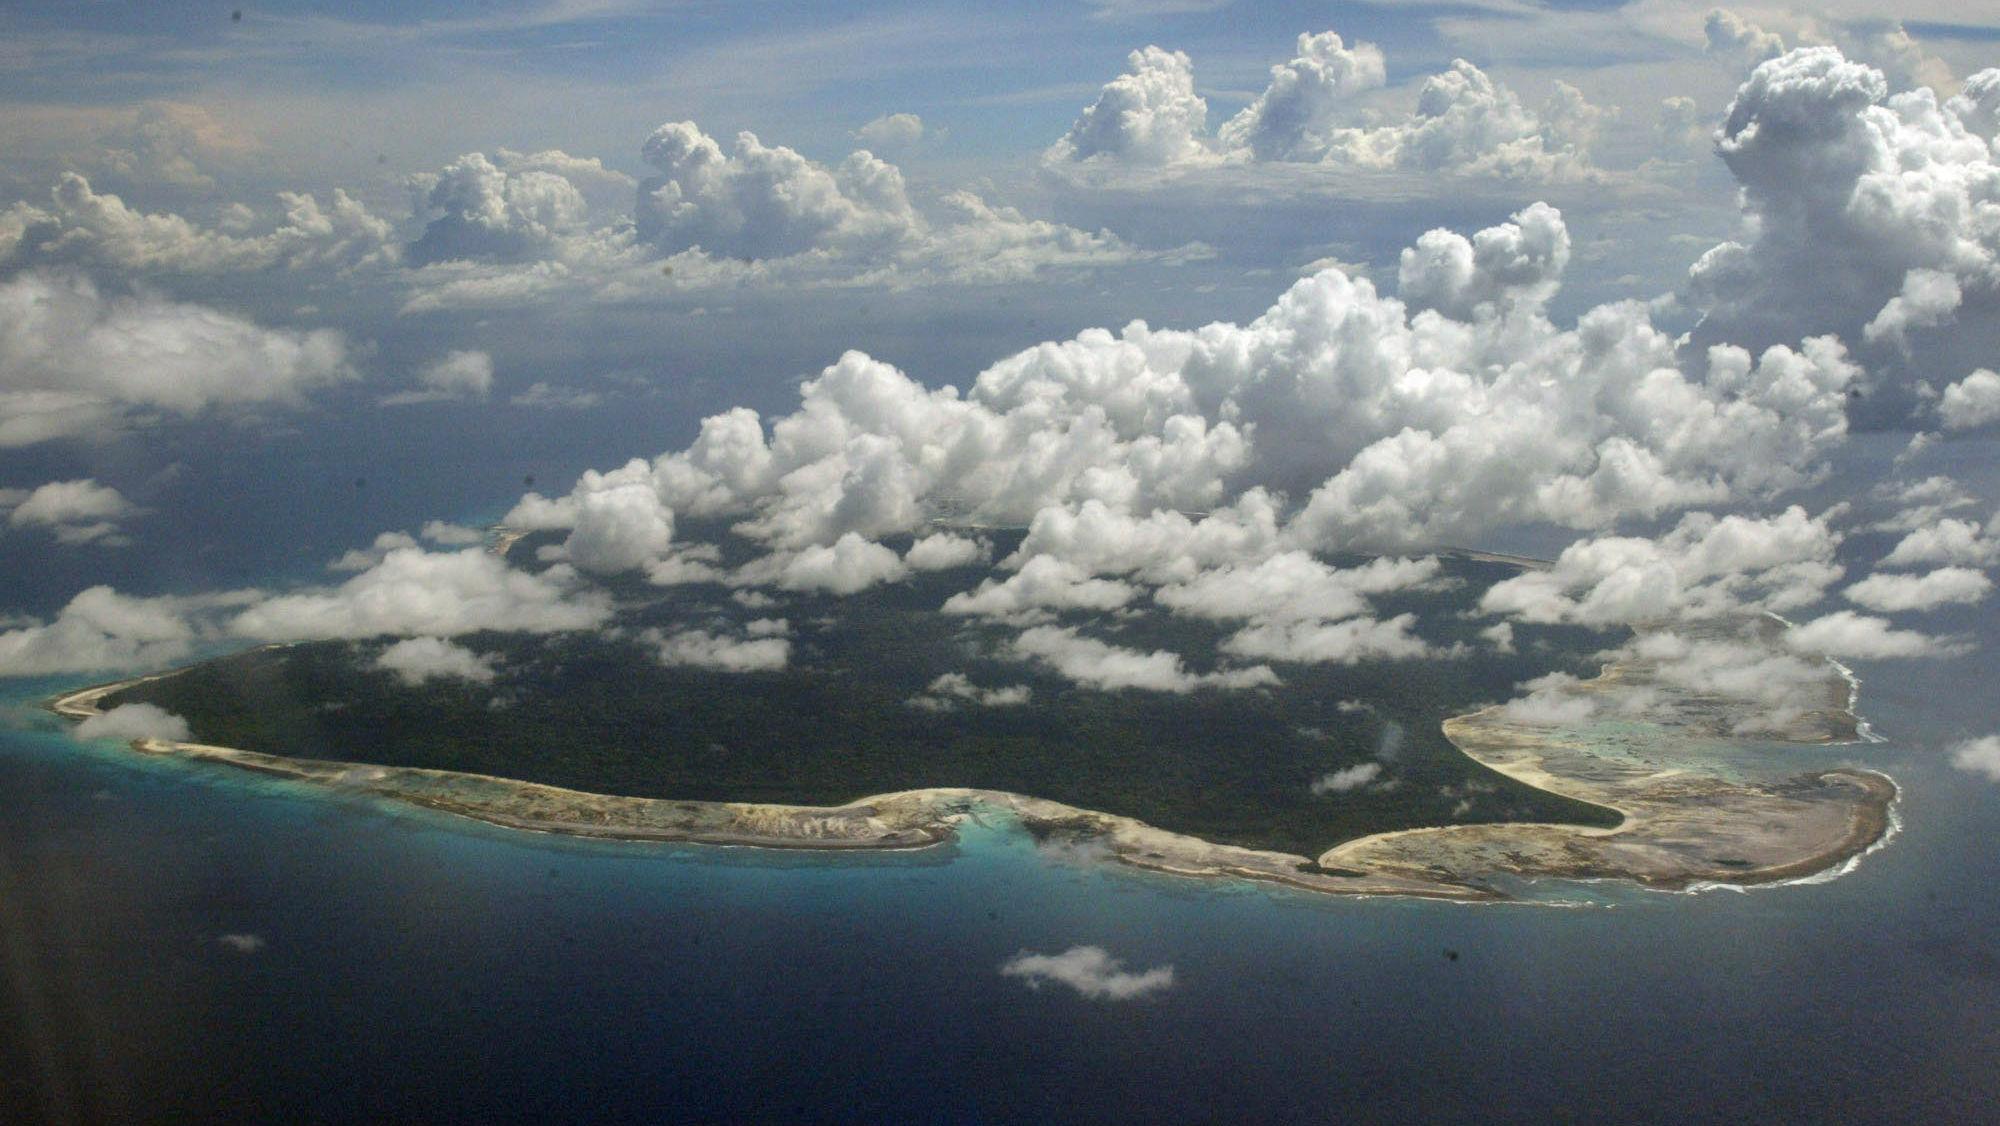 andaman island North Sentinel web